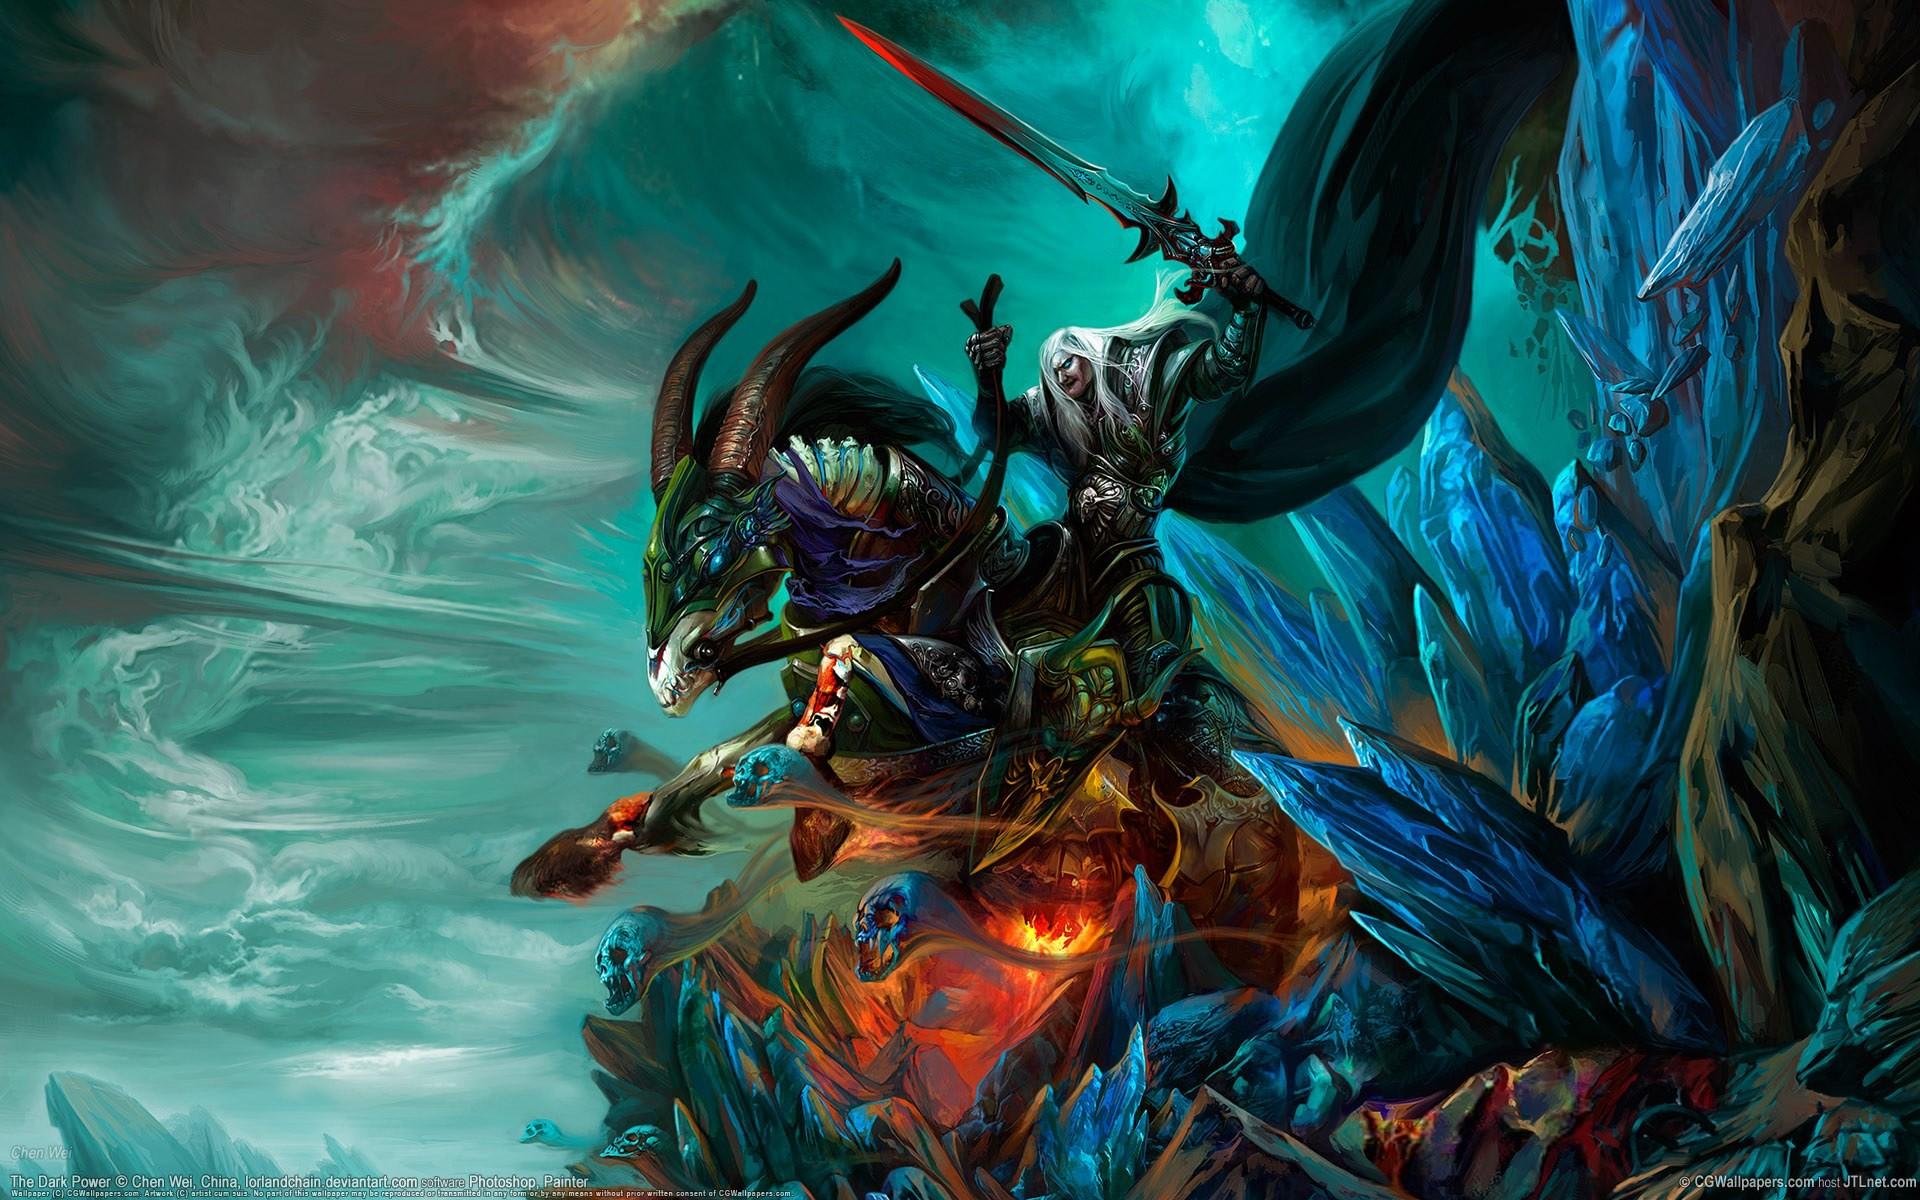 Dark Fantasy Wallpaper Hd Free Download | Wallpapers 4k | Pinterest | Dark  fantasy, Wallpaper and Dark